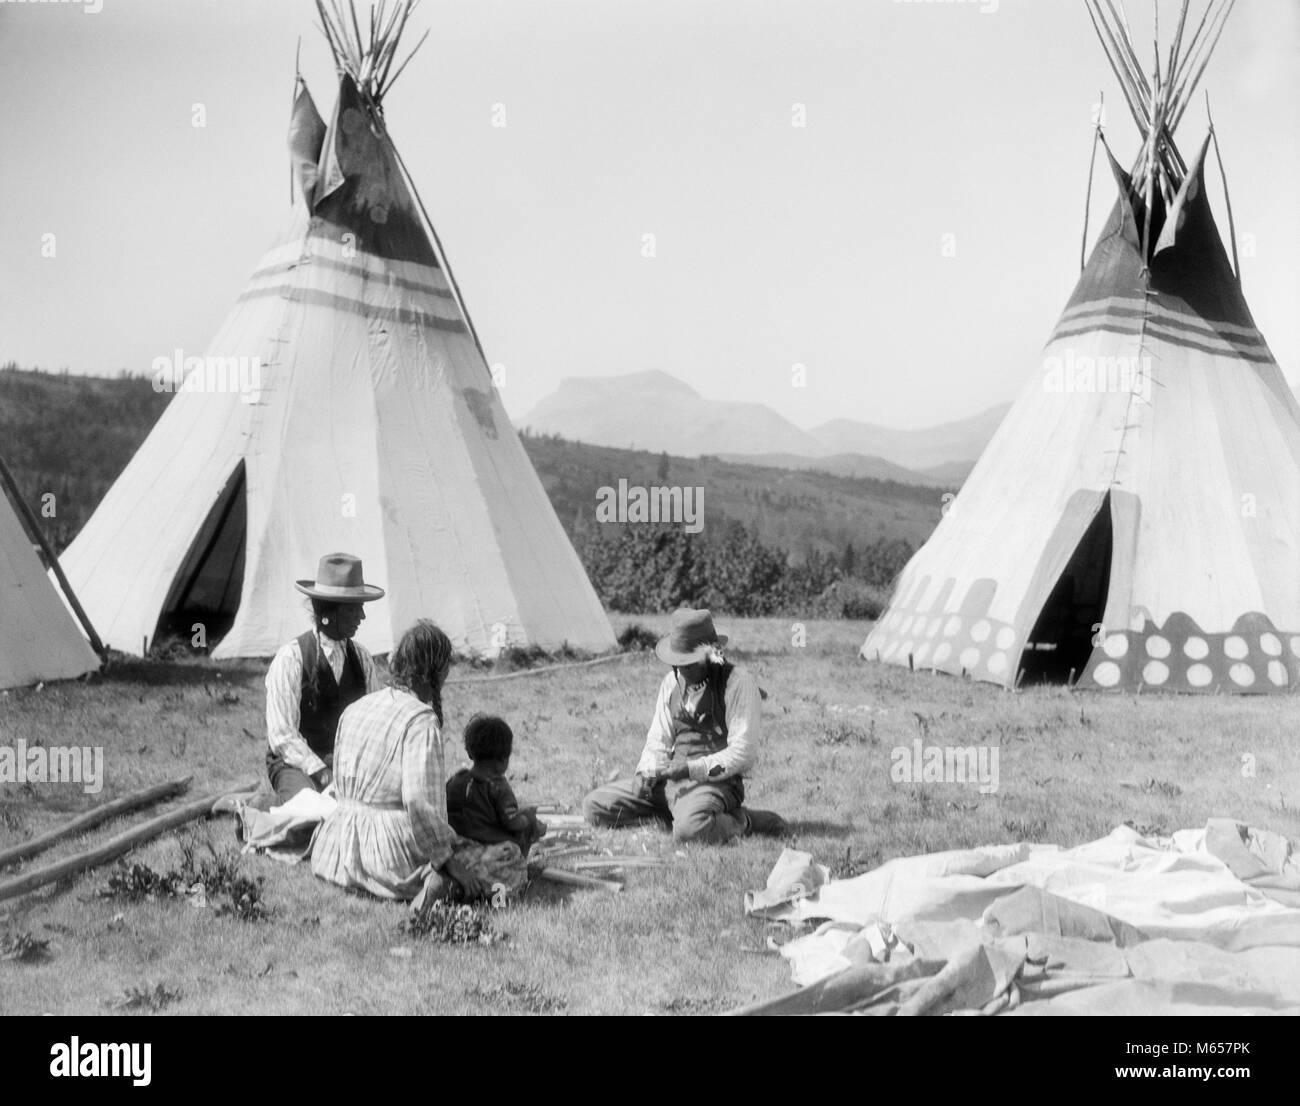 native american sioux indian boy photos native american sioux indian boy images alamy. Black Bedroom Furniture Sets. Home Design Ideas